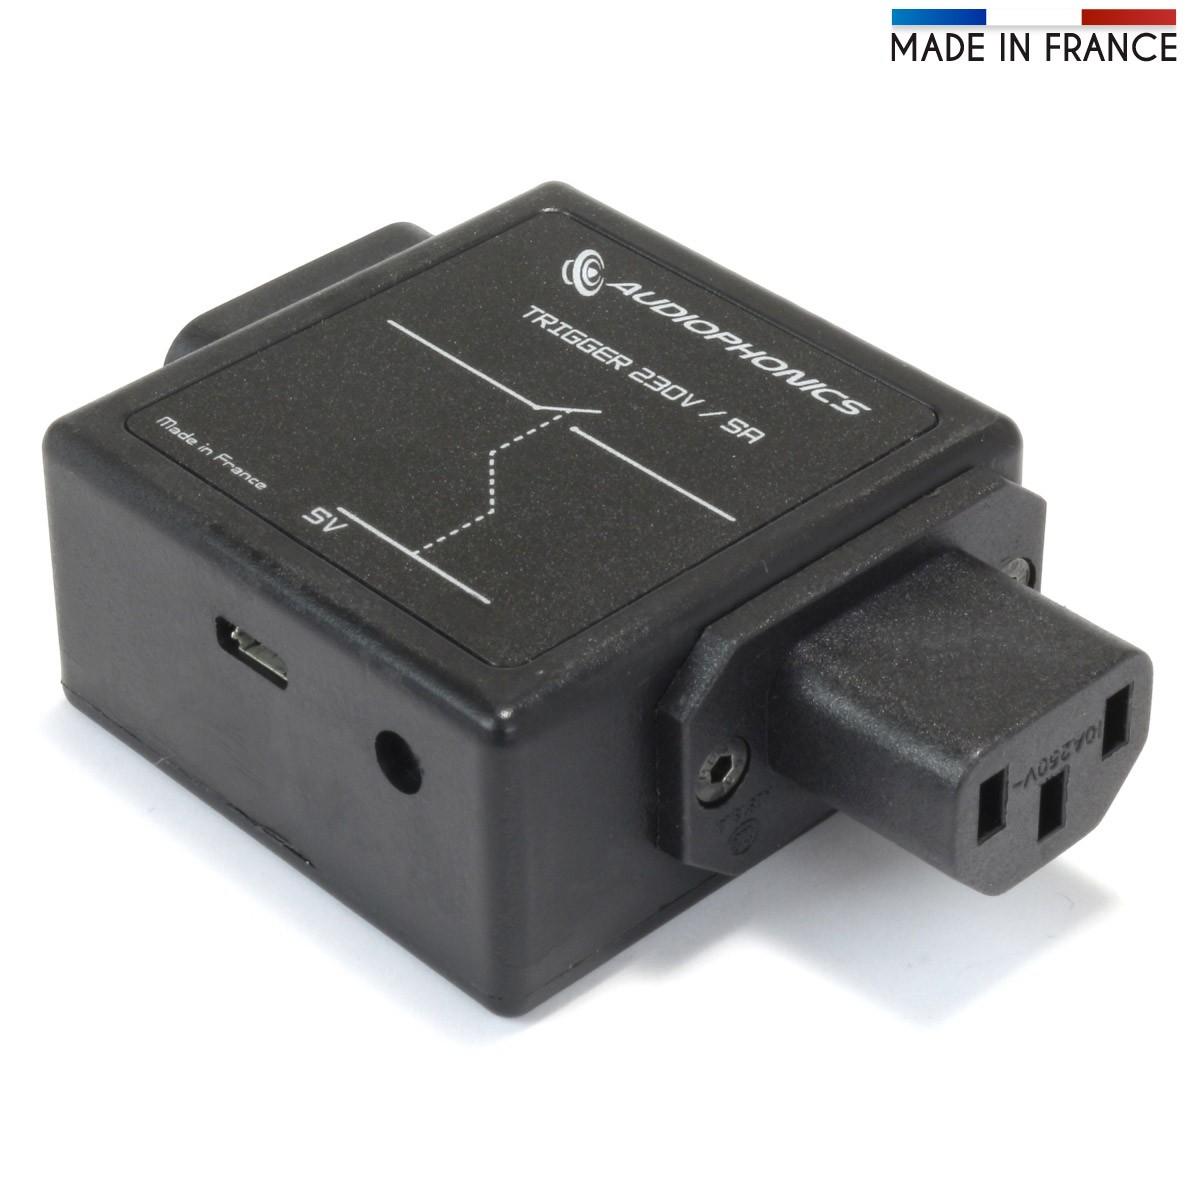 AUDIOPHONICS Trigger Micro-USB 5V 230 V Slave Power Supply Device